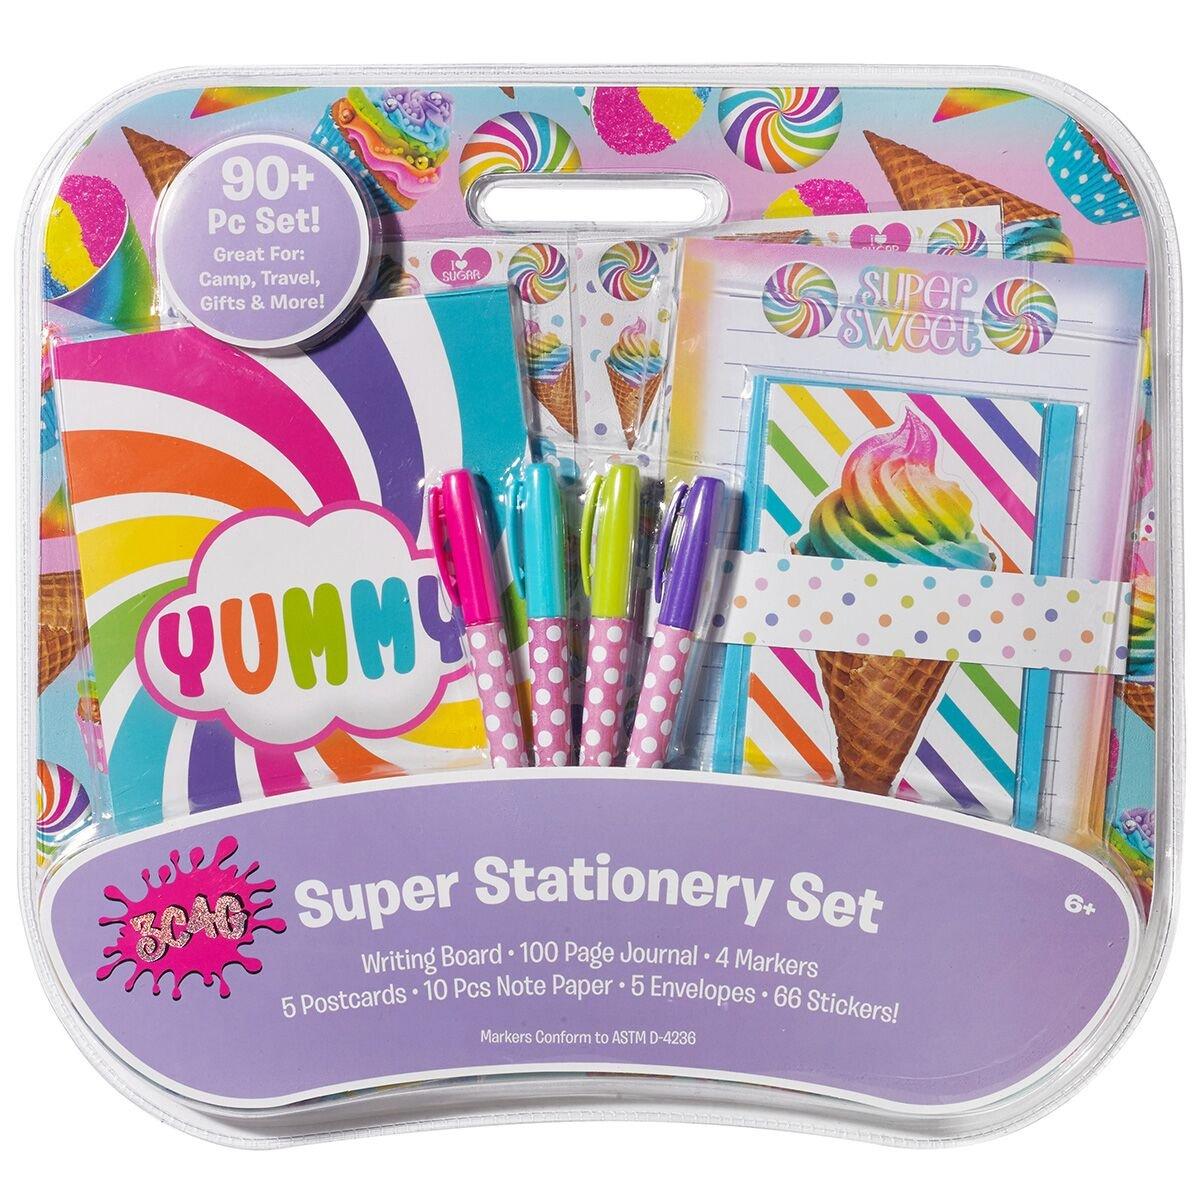 3C4G Super Sweet Stationery Set Lap Desk (36199) by 3C4G (Image #3)